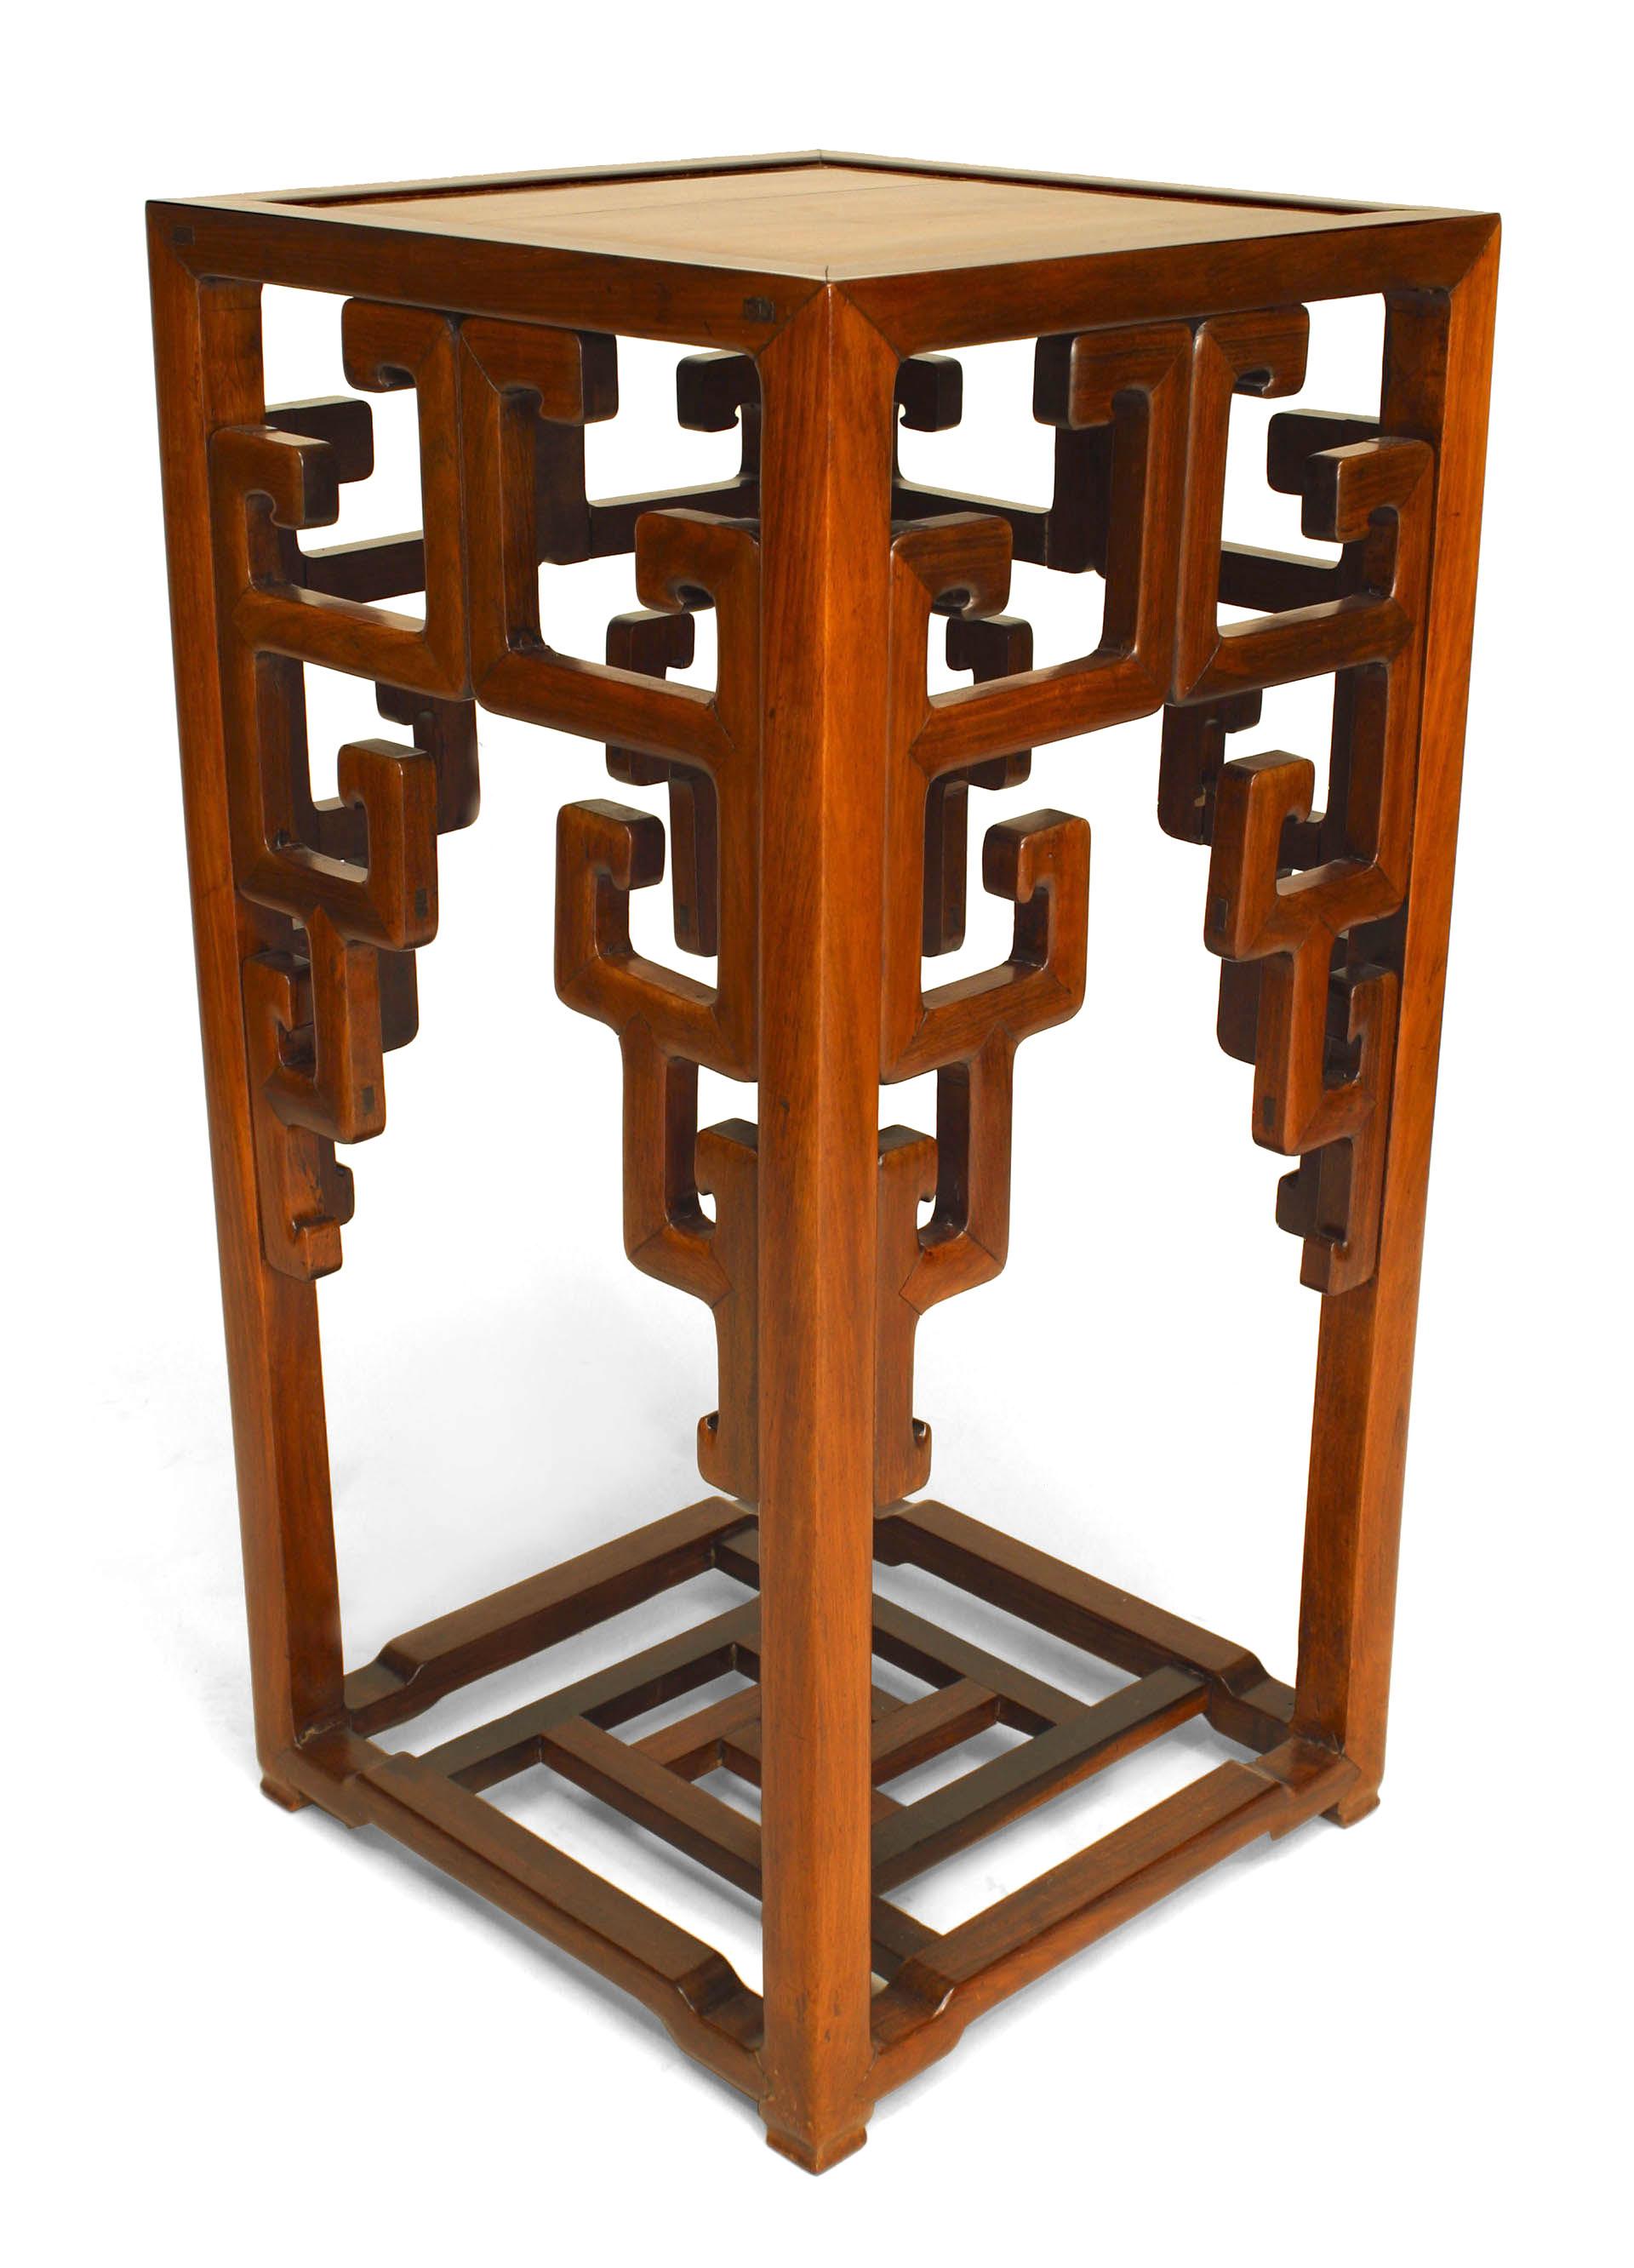 "stand display pedestal black Ebony wood China rosewood shelf 步步高黑檀木架子 13.4/""L"